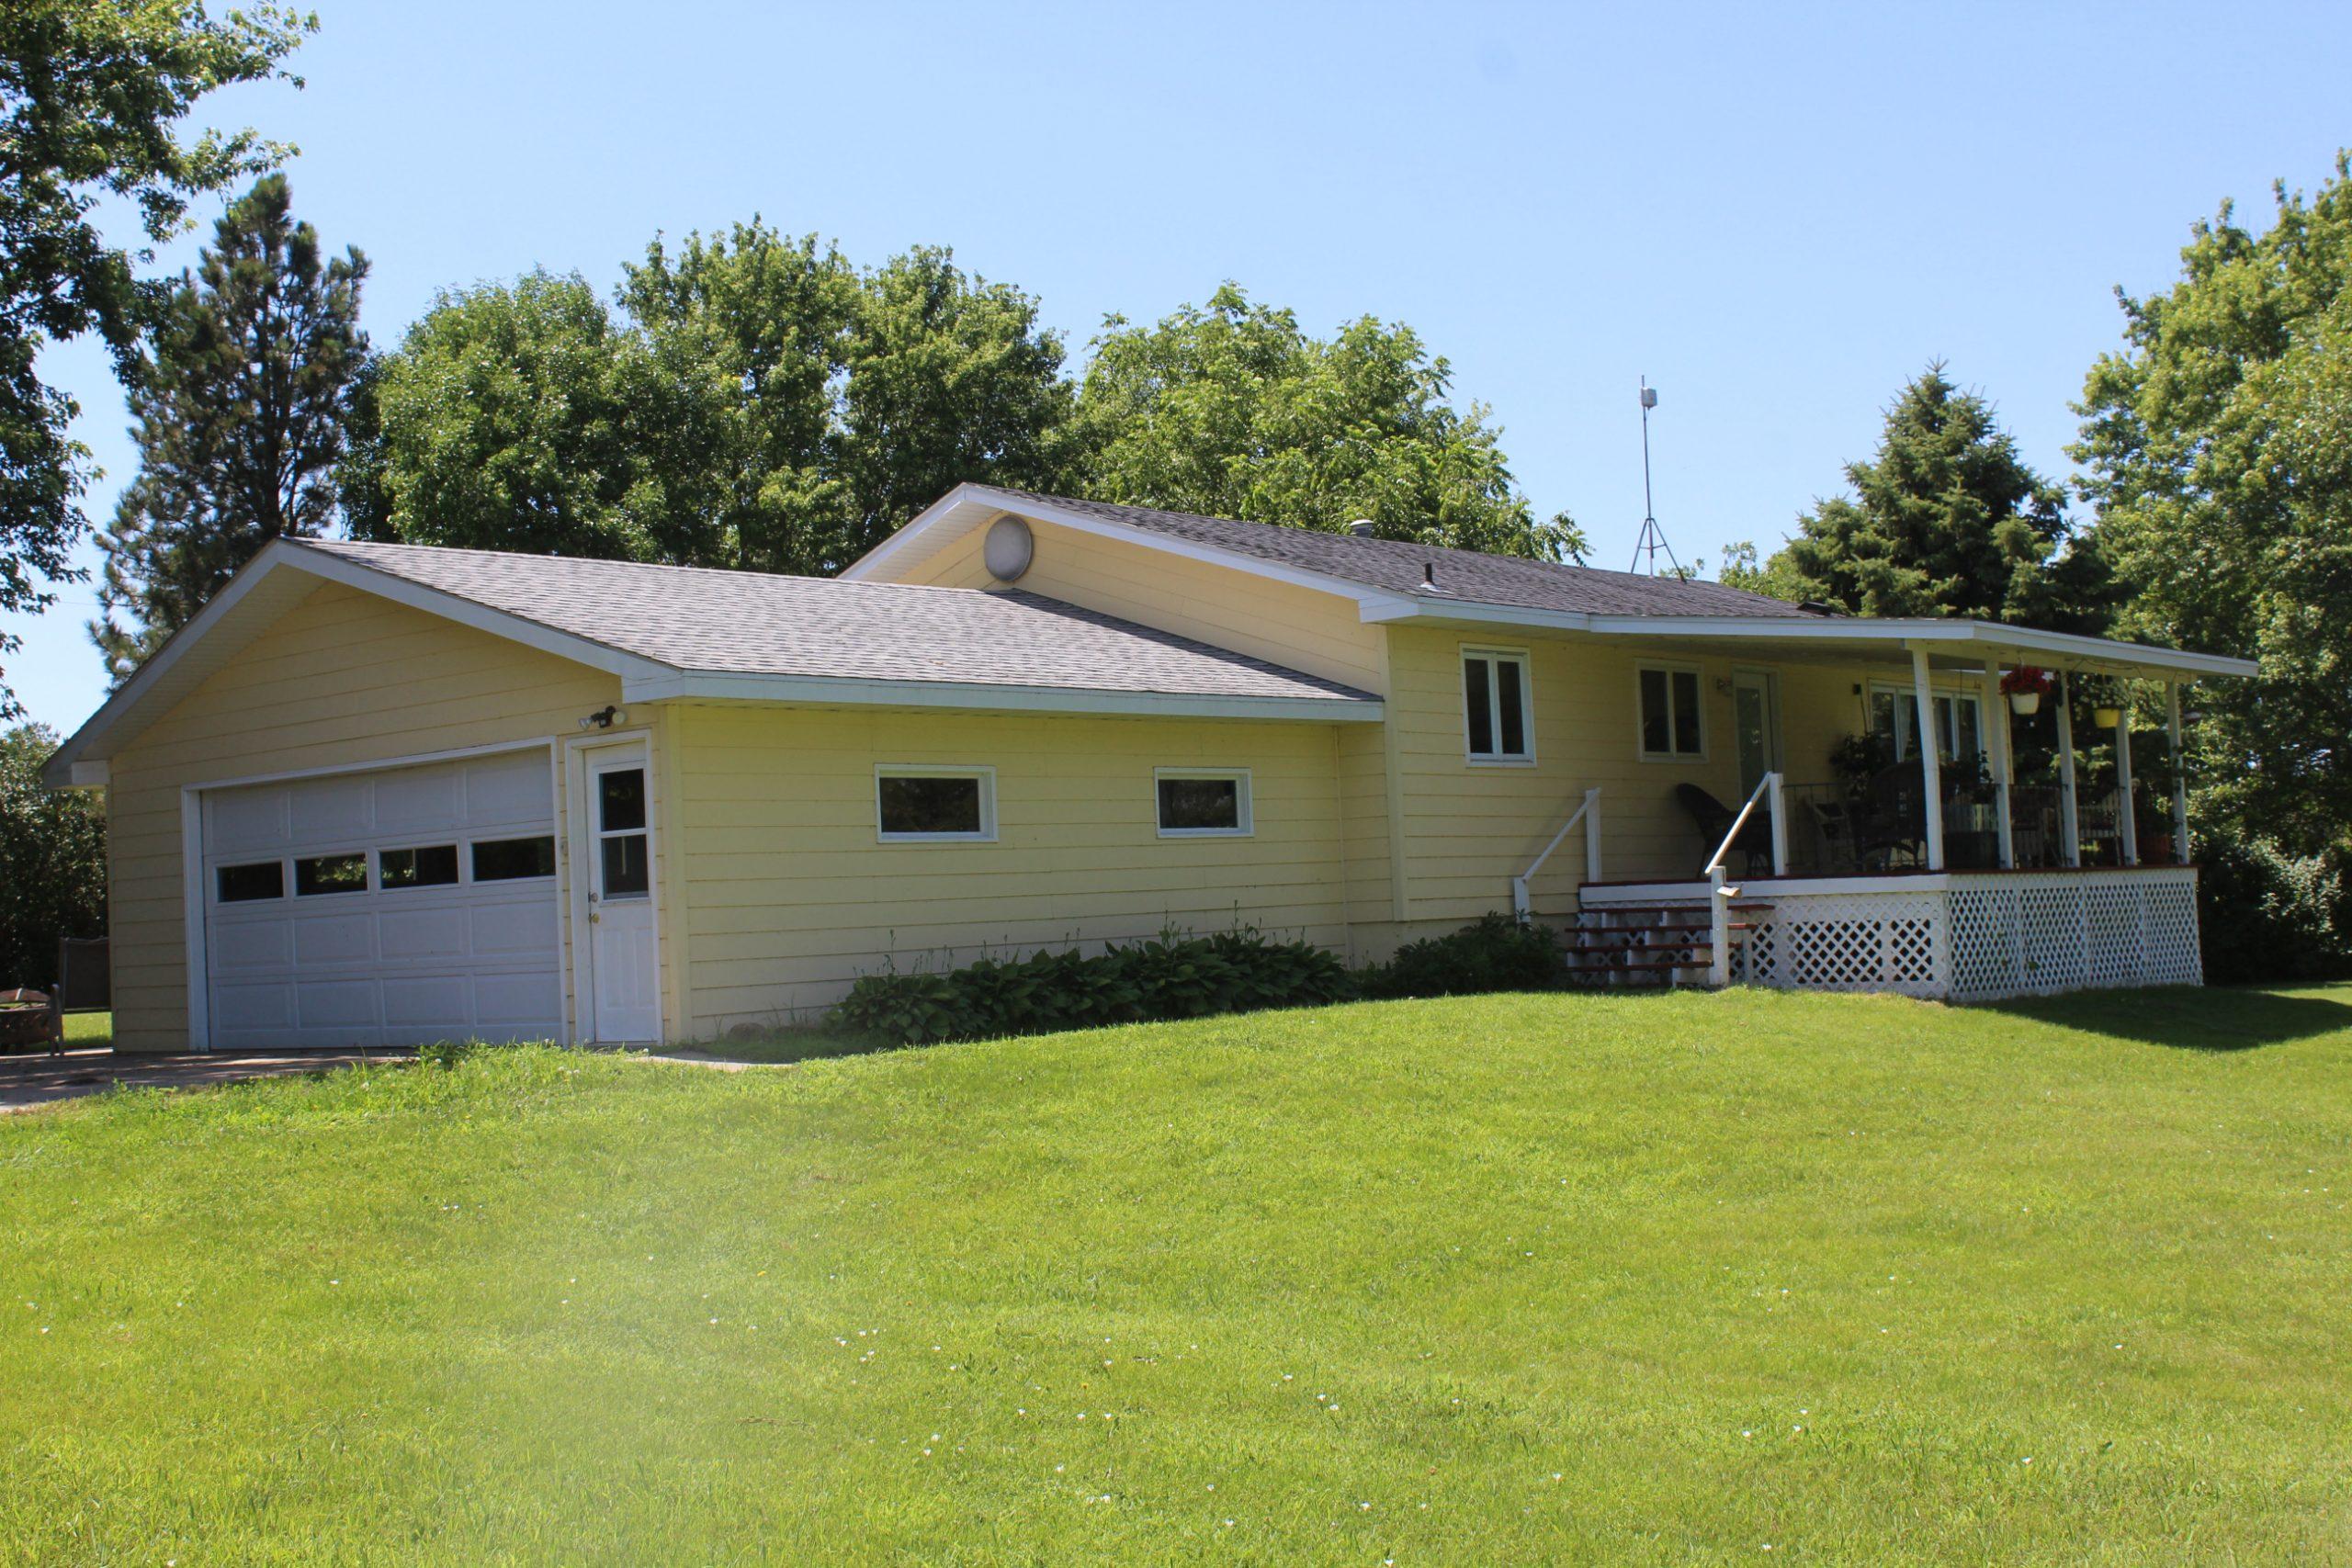 8/18 Beadle County Acreage Auction 3:00 PM